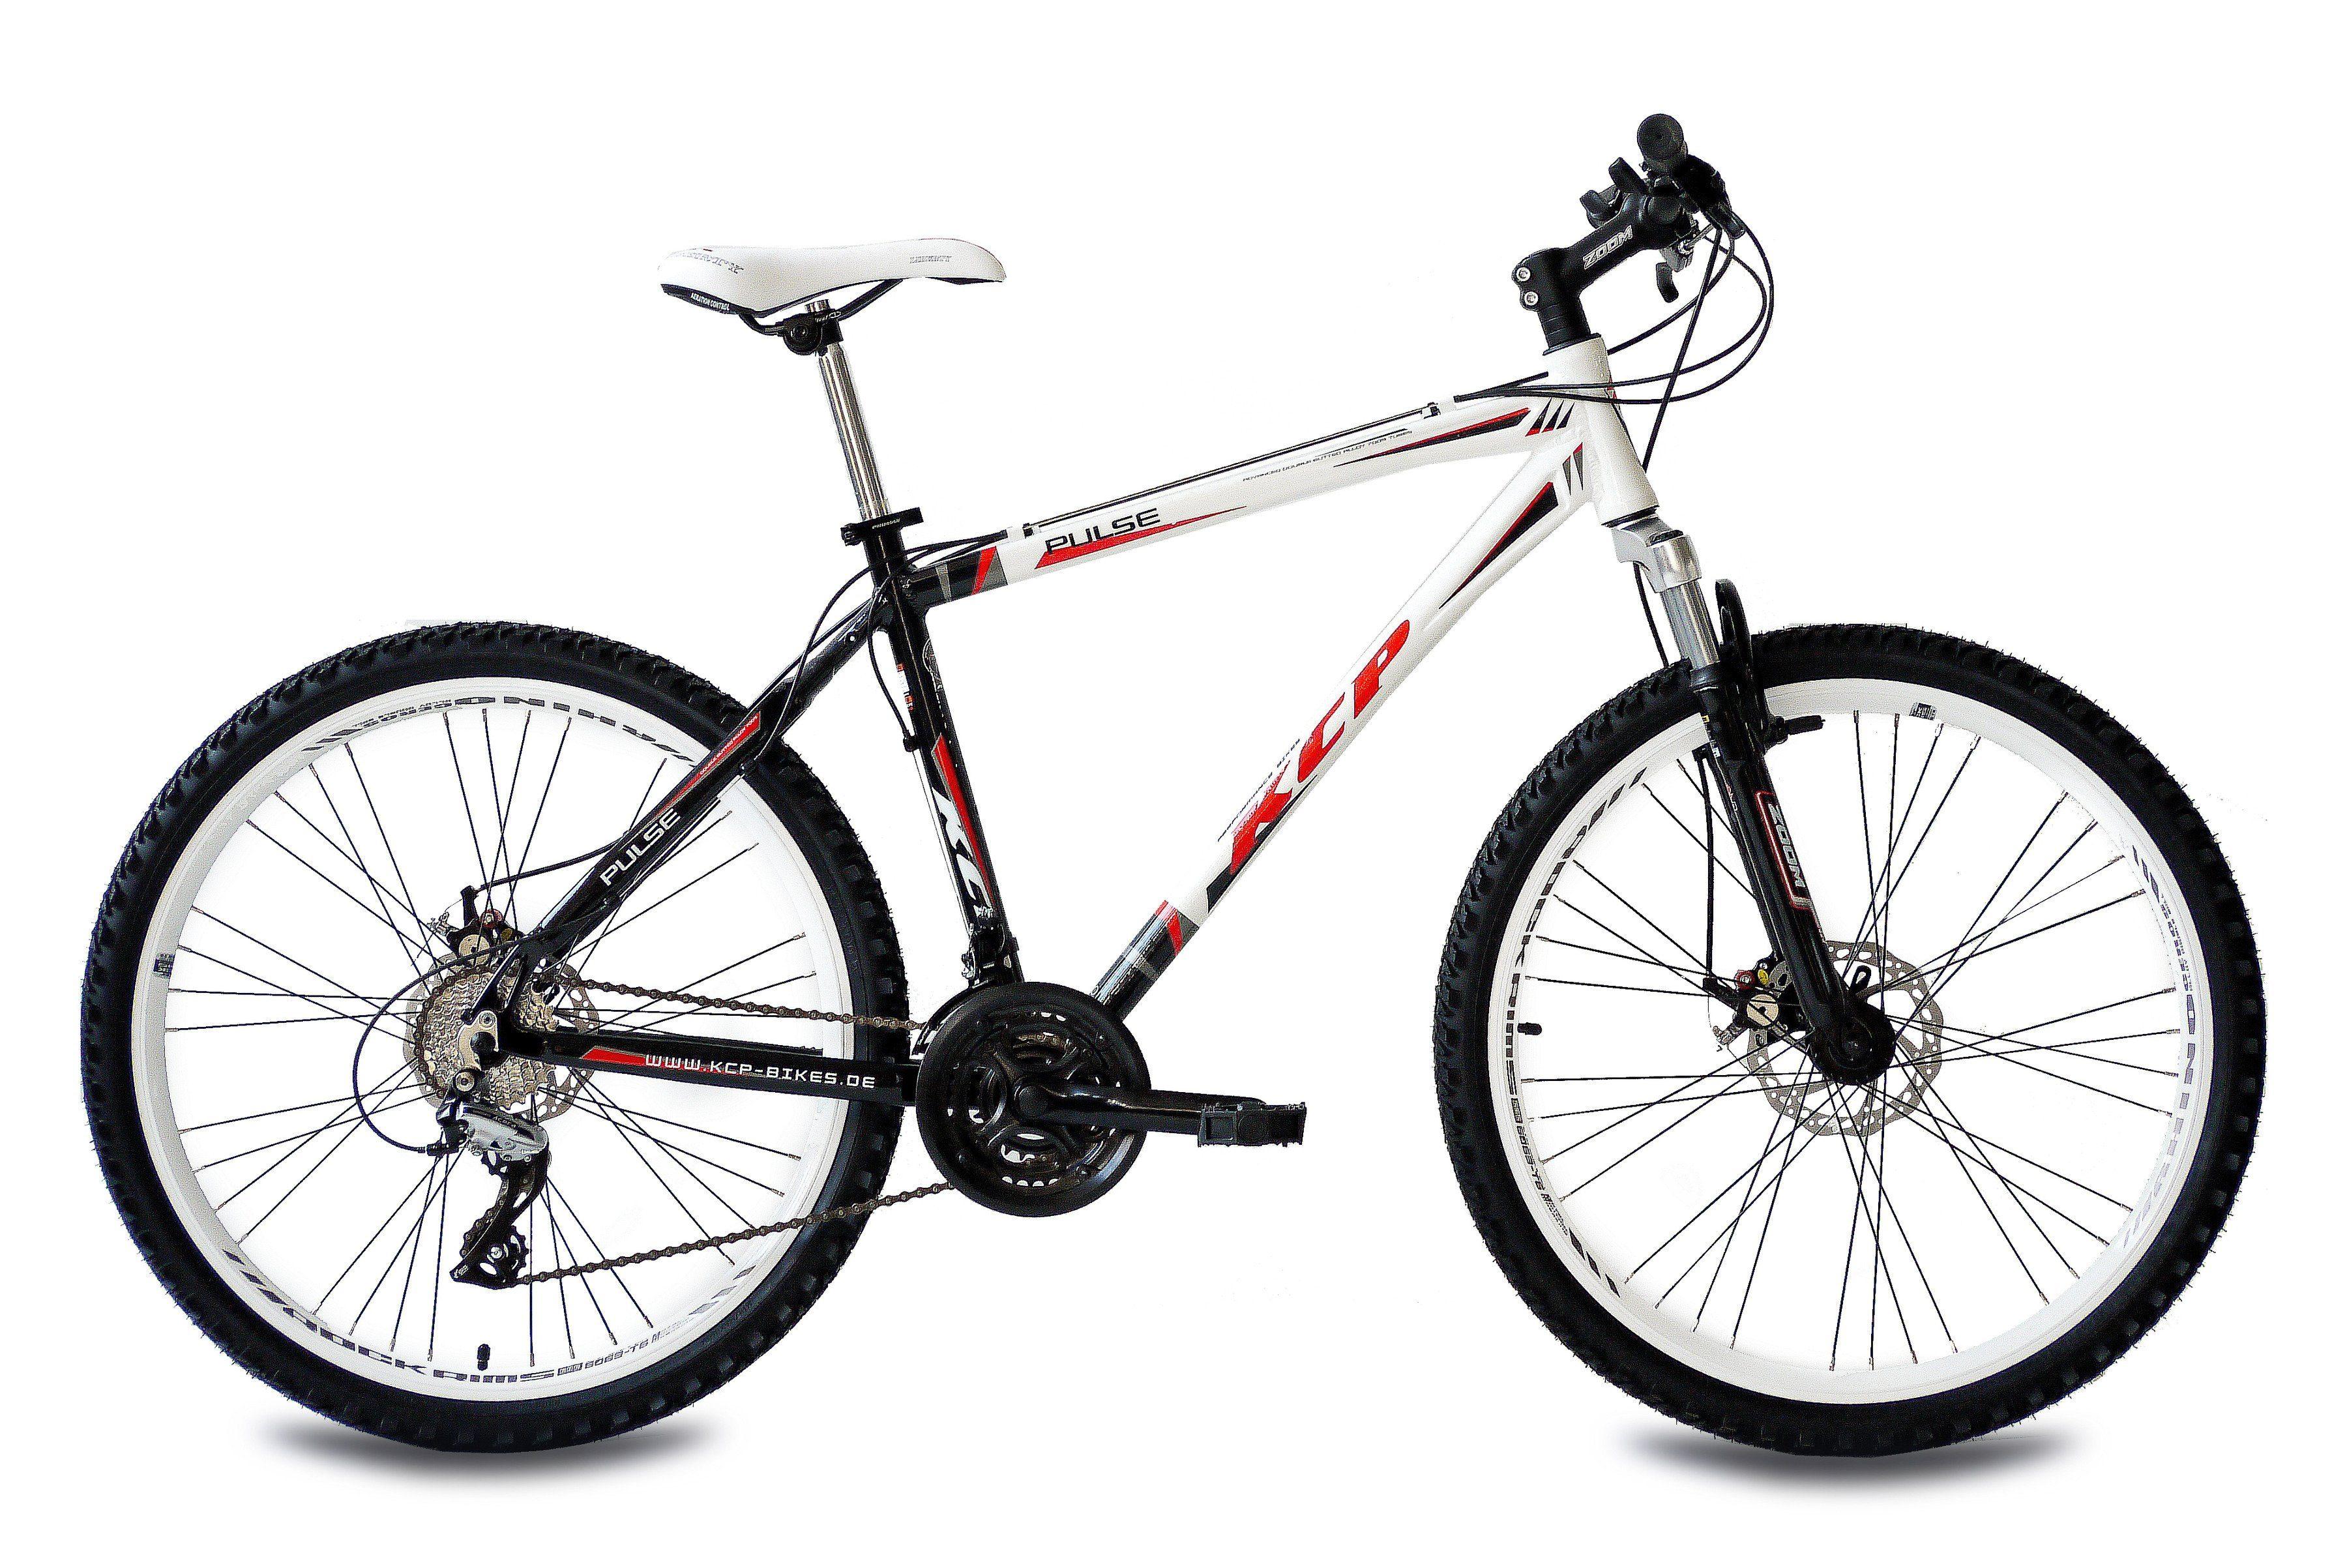 KCP Mountainbike »Pulse, 66,04 cm (26 Zoll)«